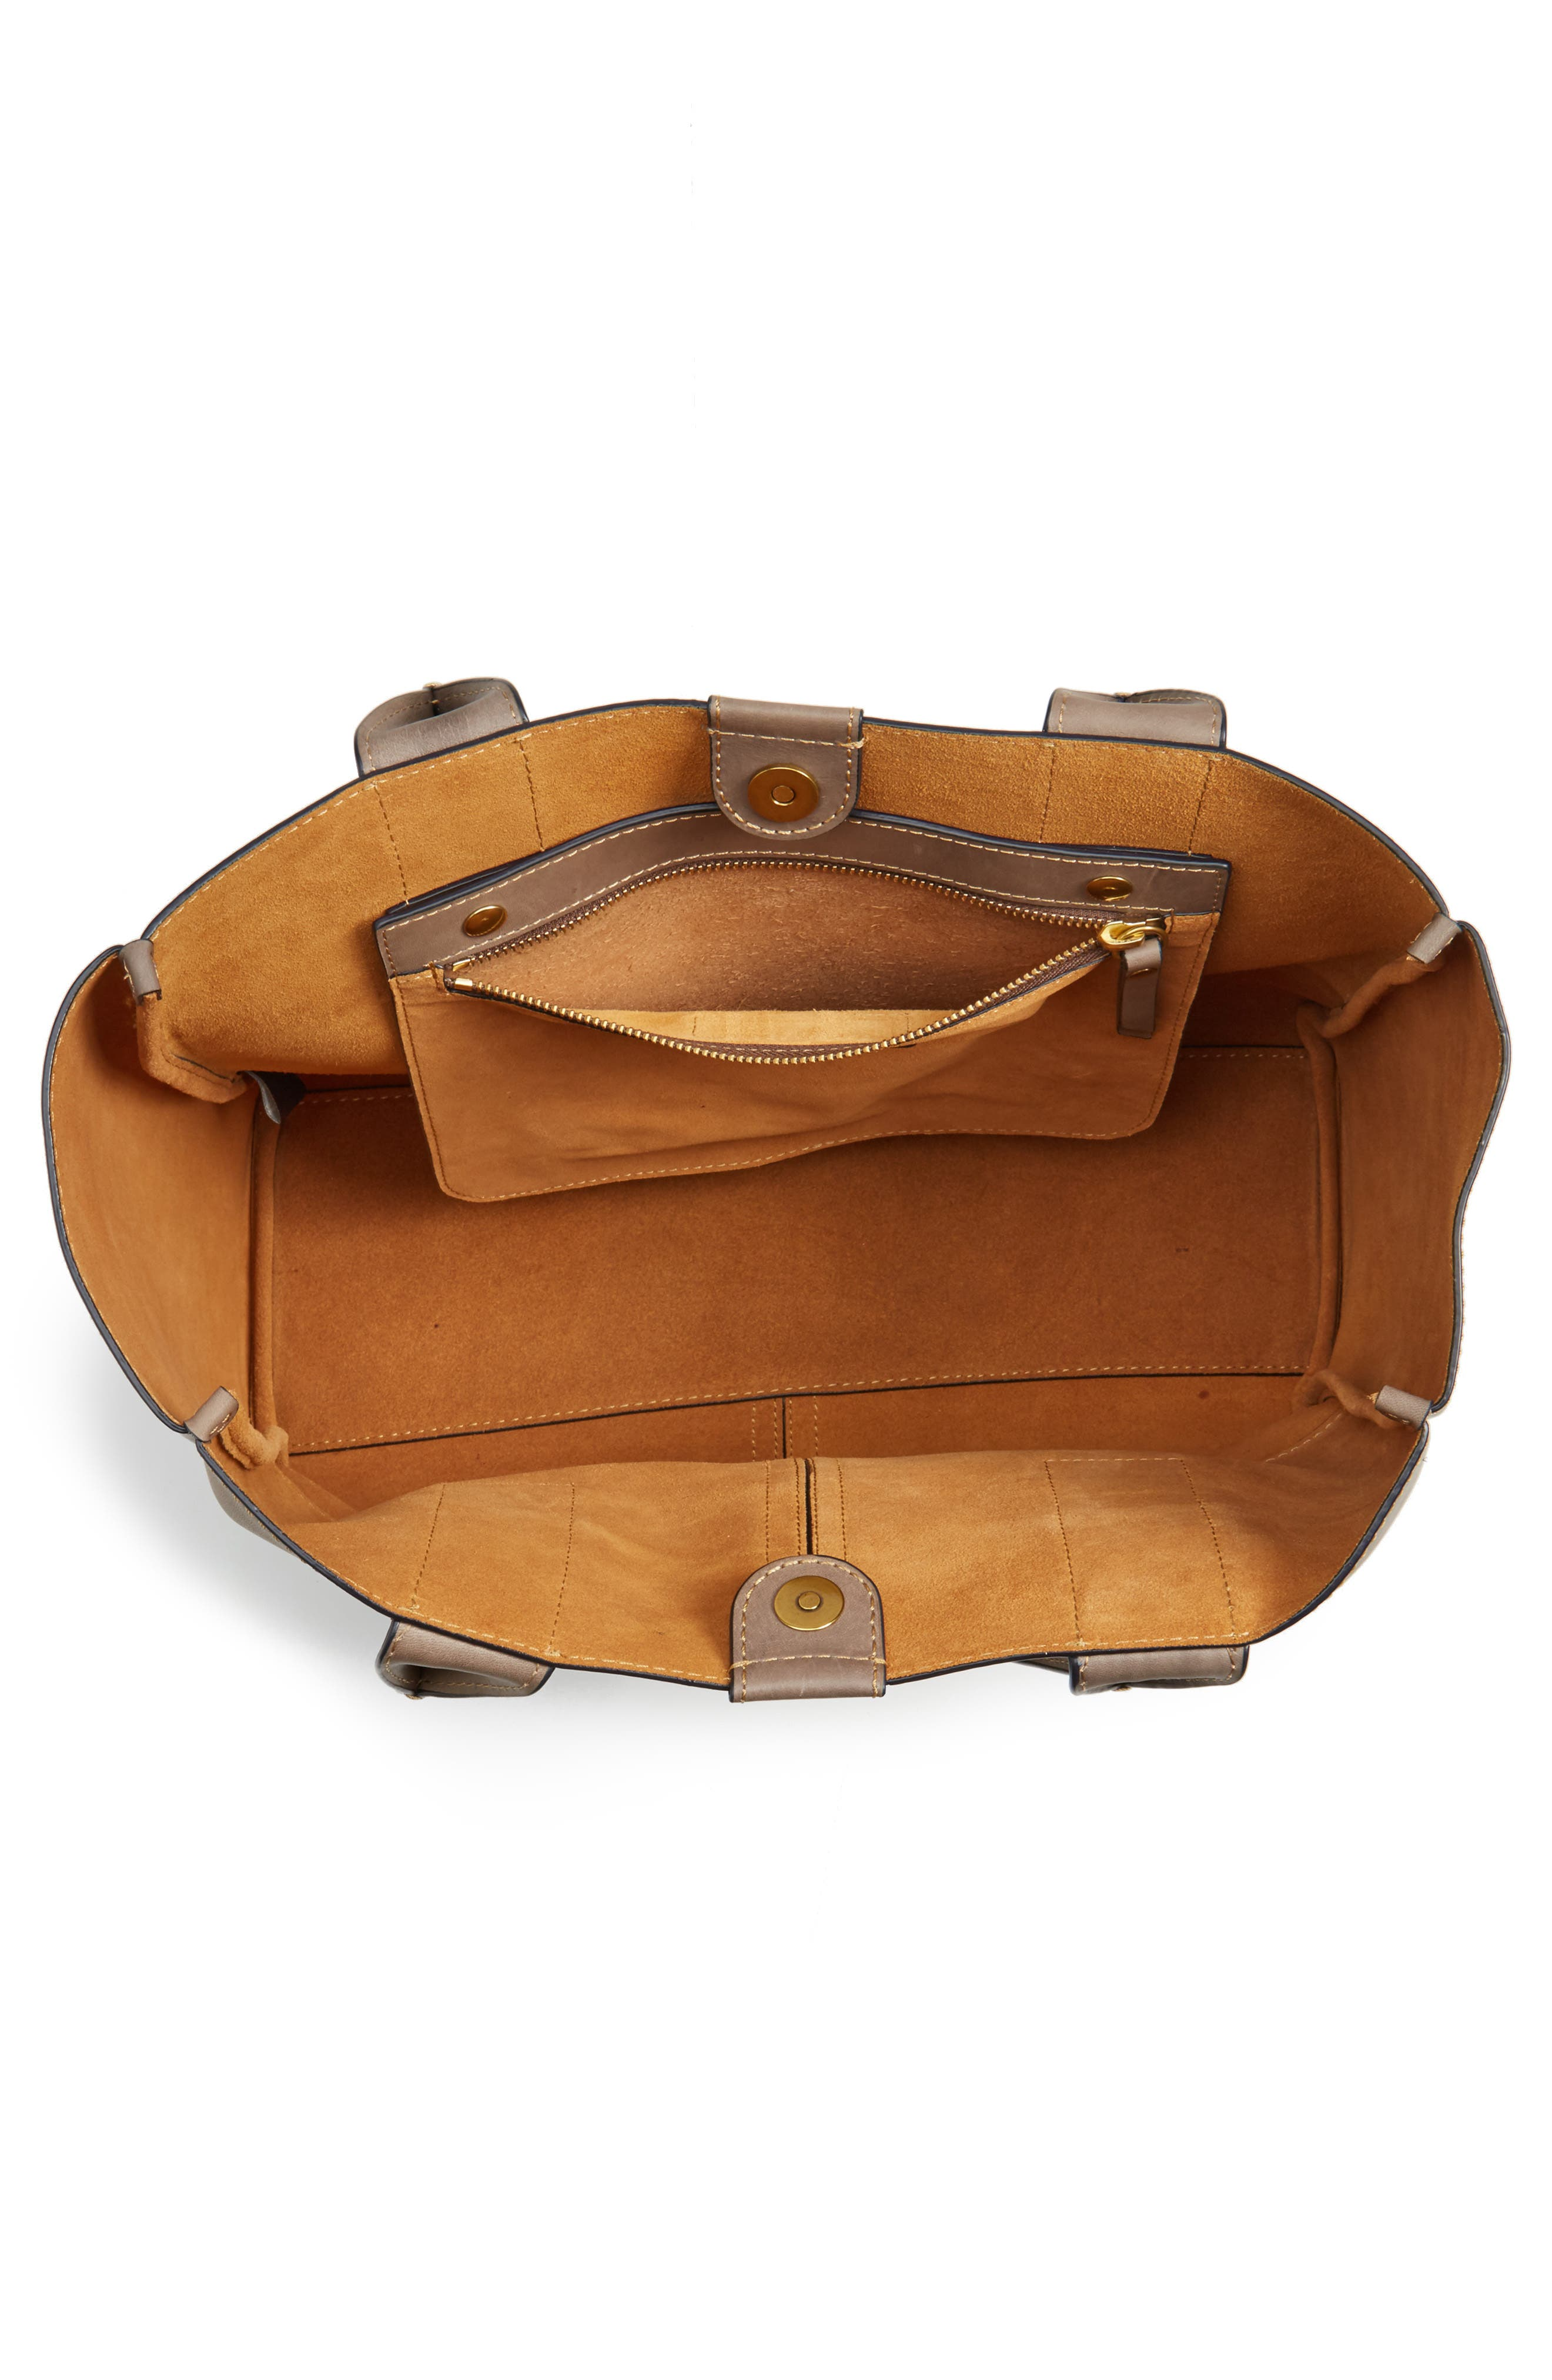 Ilana Harness Leather Shopper,                             Alternate thumbnail 4, color,                             030